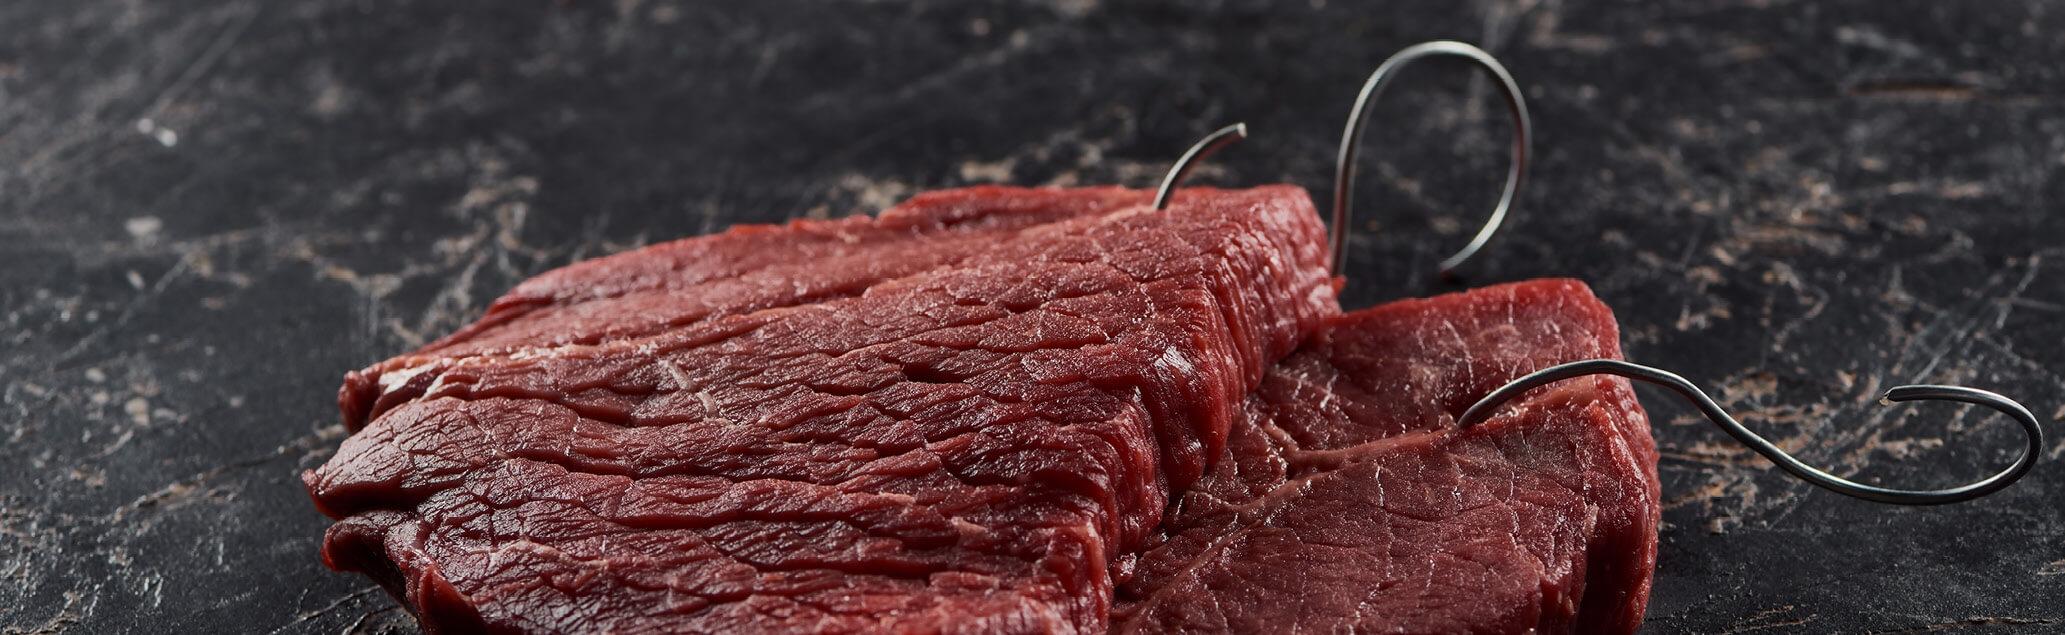 Carnicería Pollería